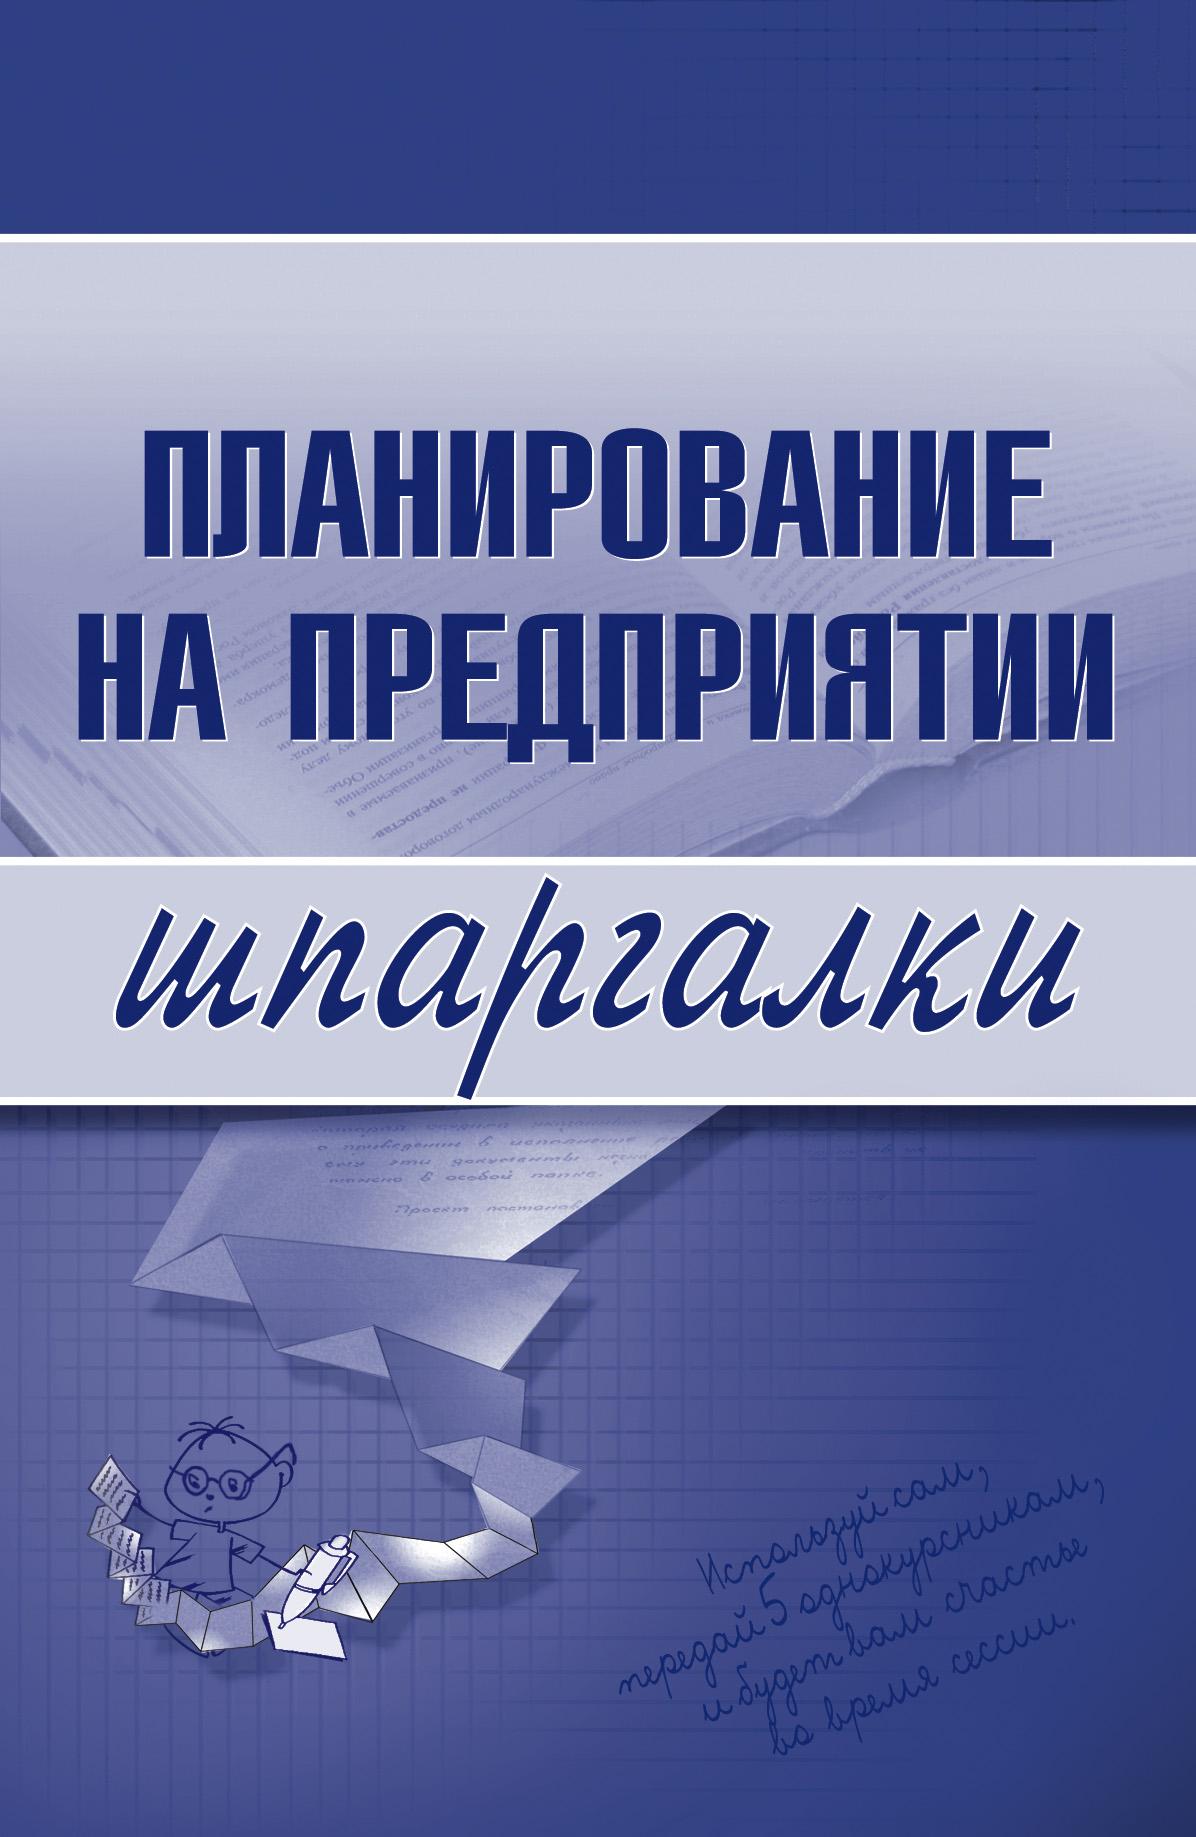 Мария Васильченко Планирование на предприятии мария васильченко планирование на предприятии